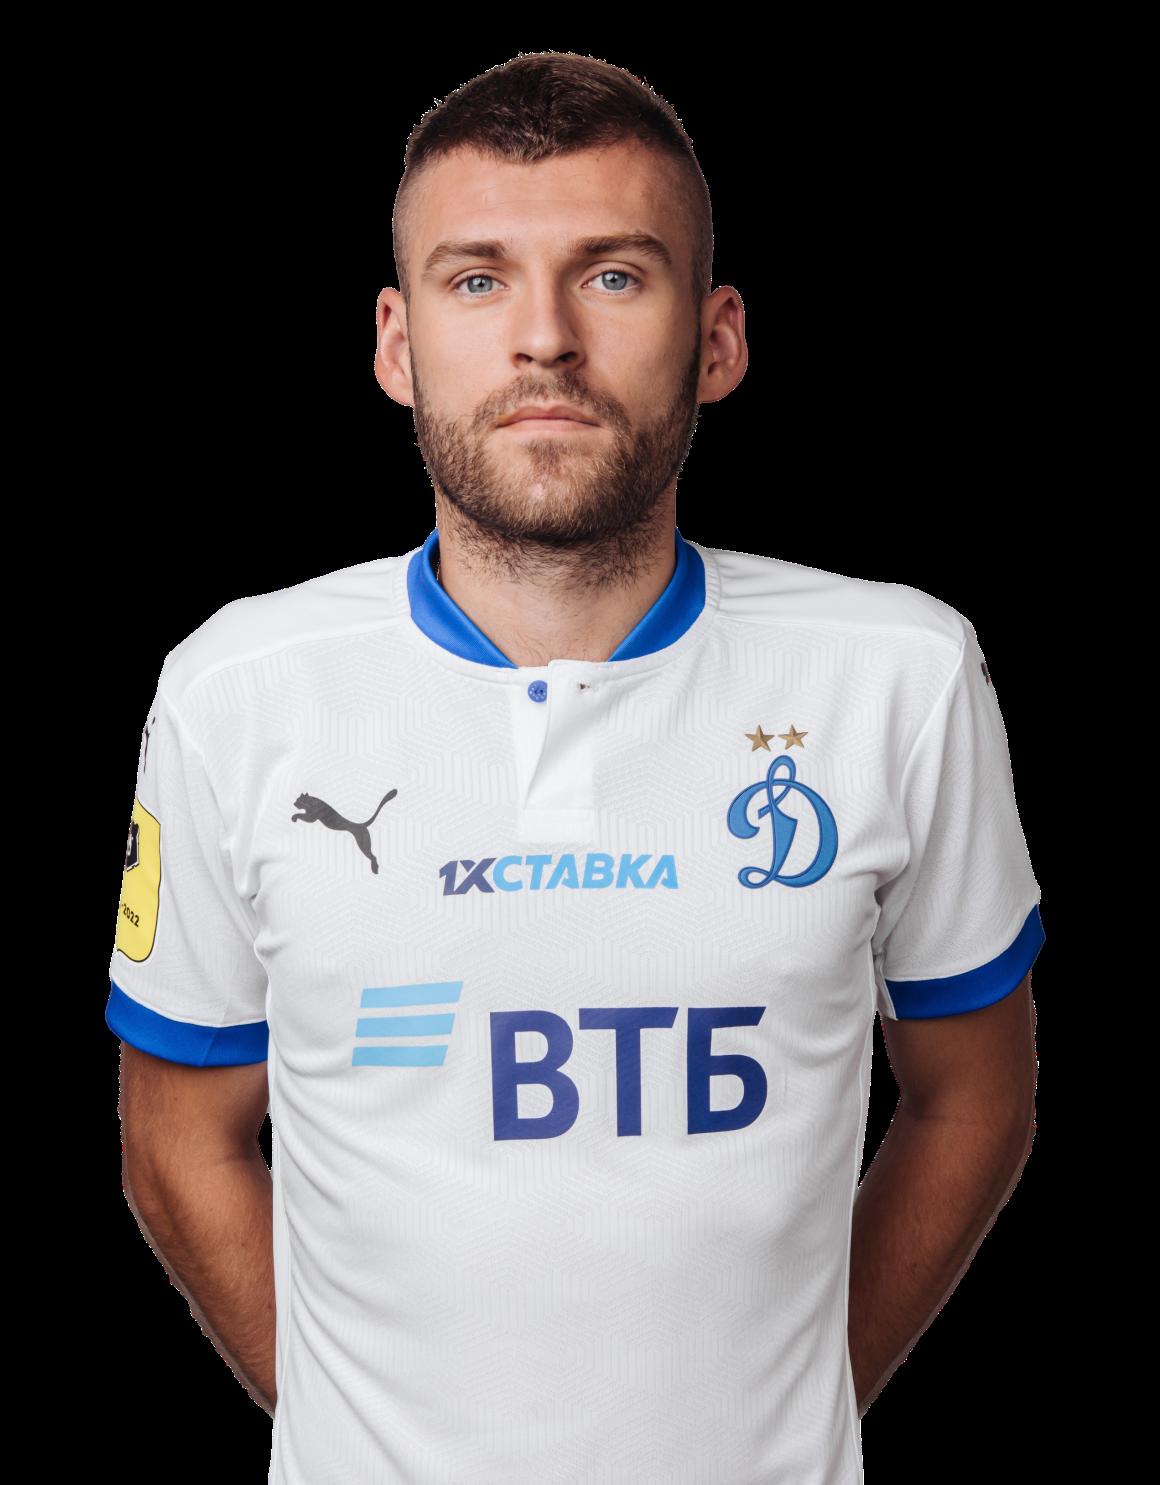 Dmitri Skopintsev